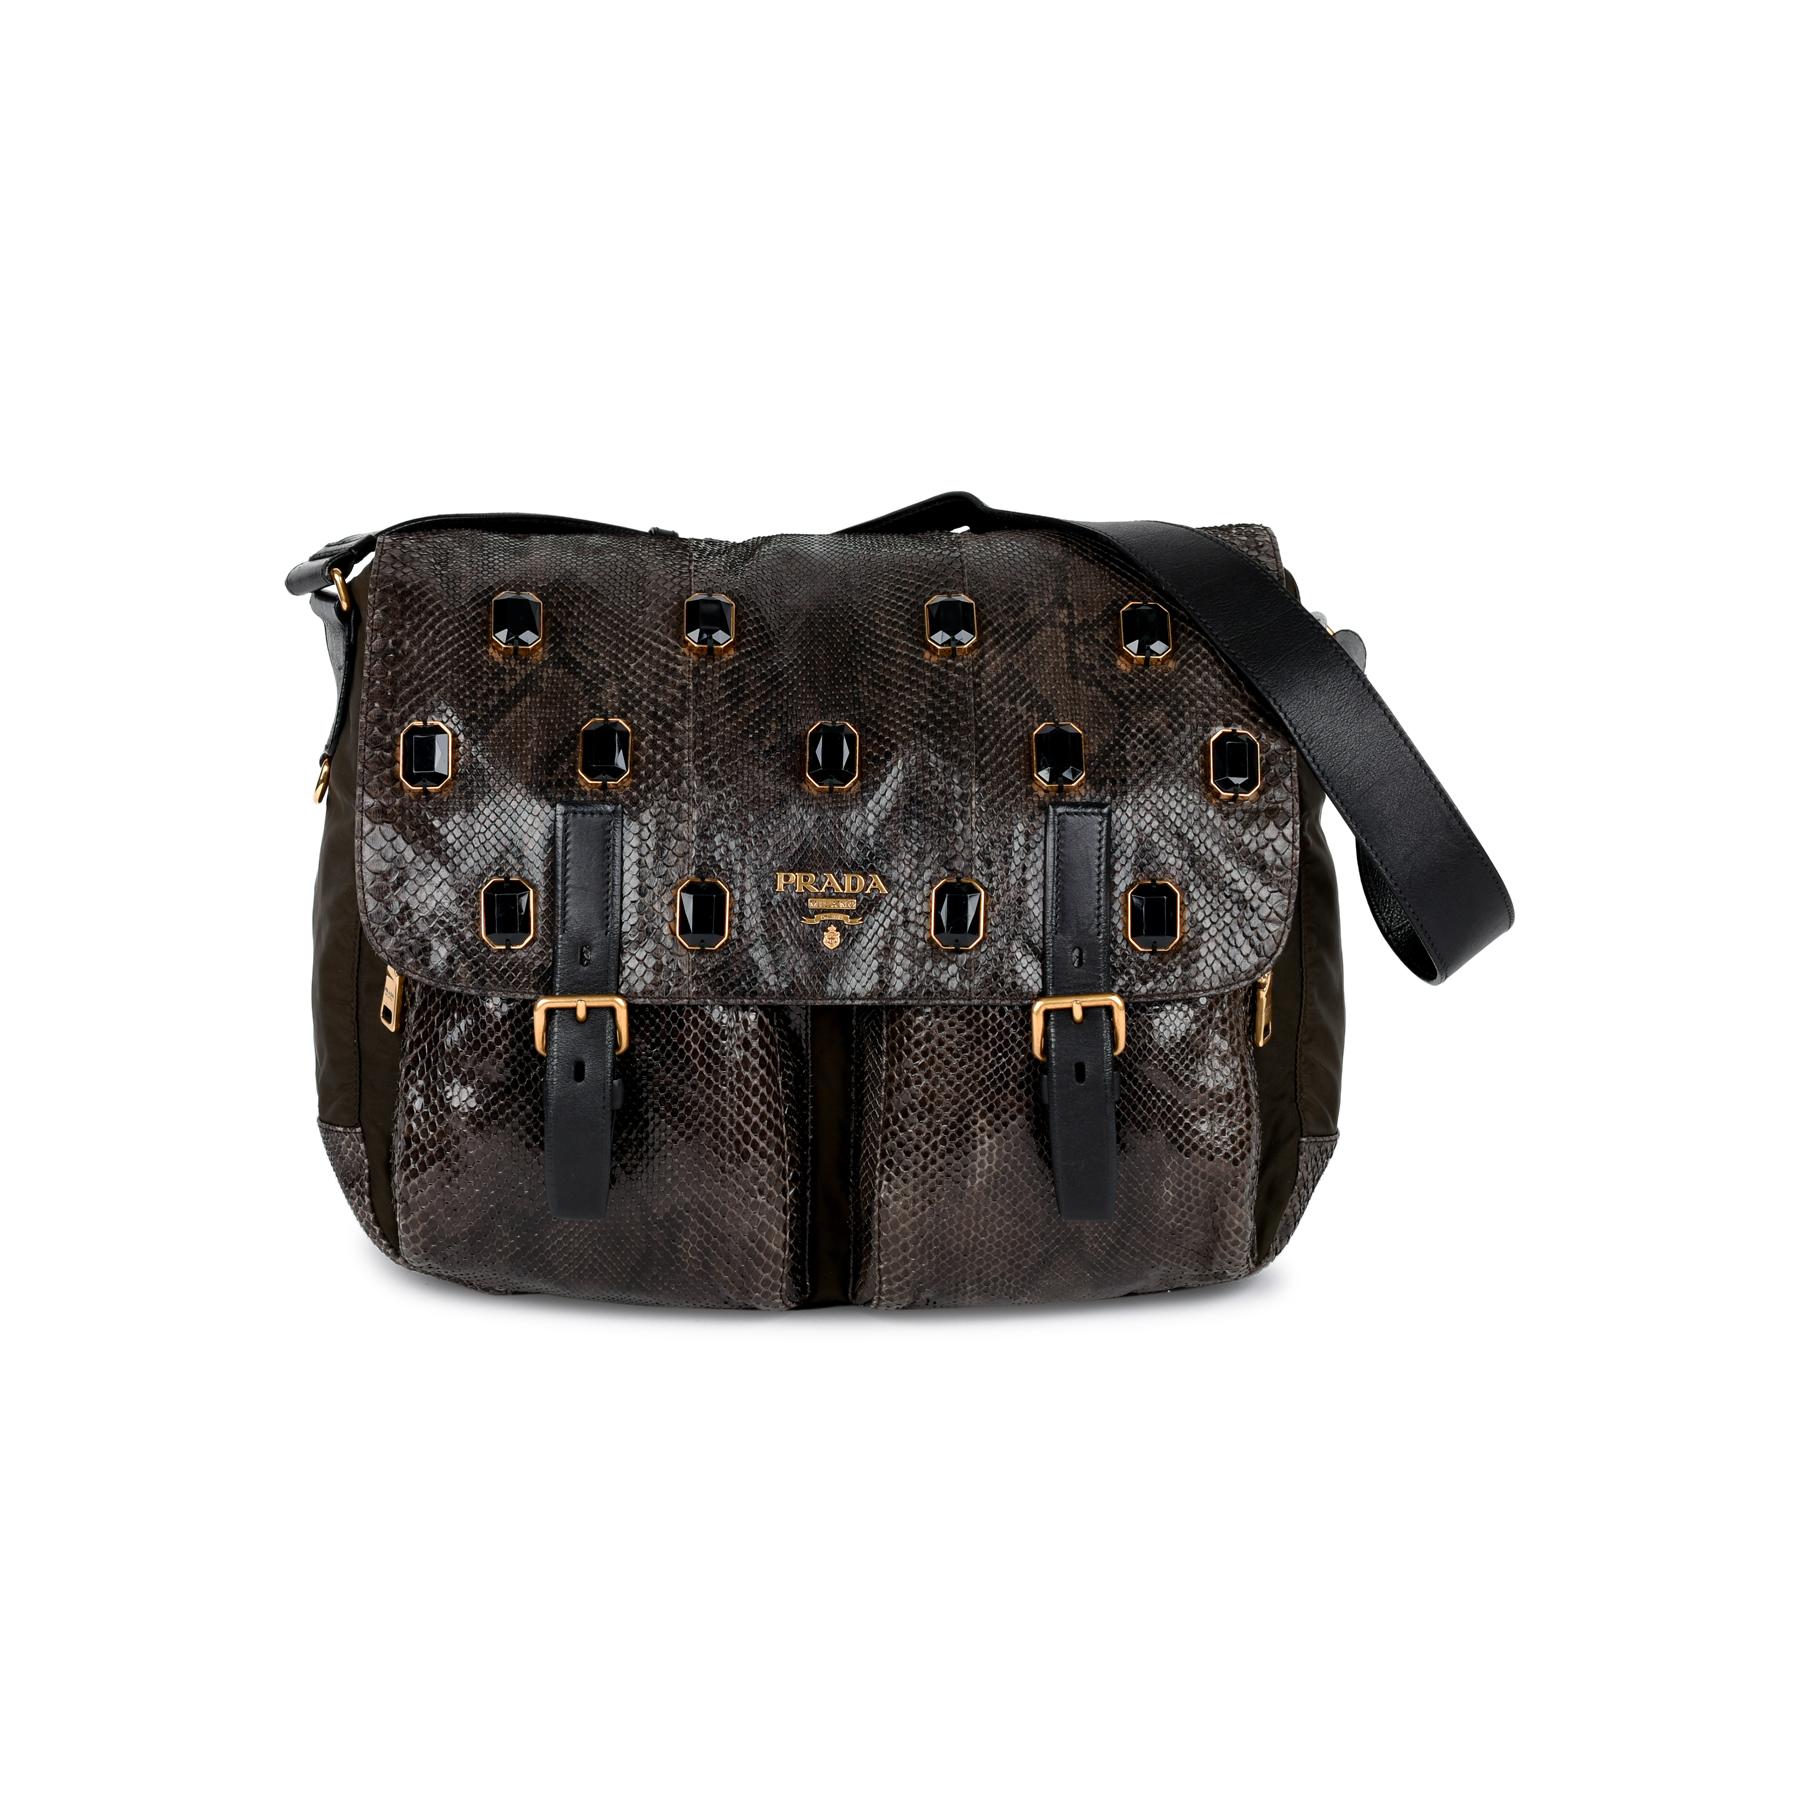 6627ebc53c8e16 ... coupon code for second hand prada python jewel messenger bag the fifth  collection 10872 2bc0a